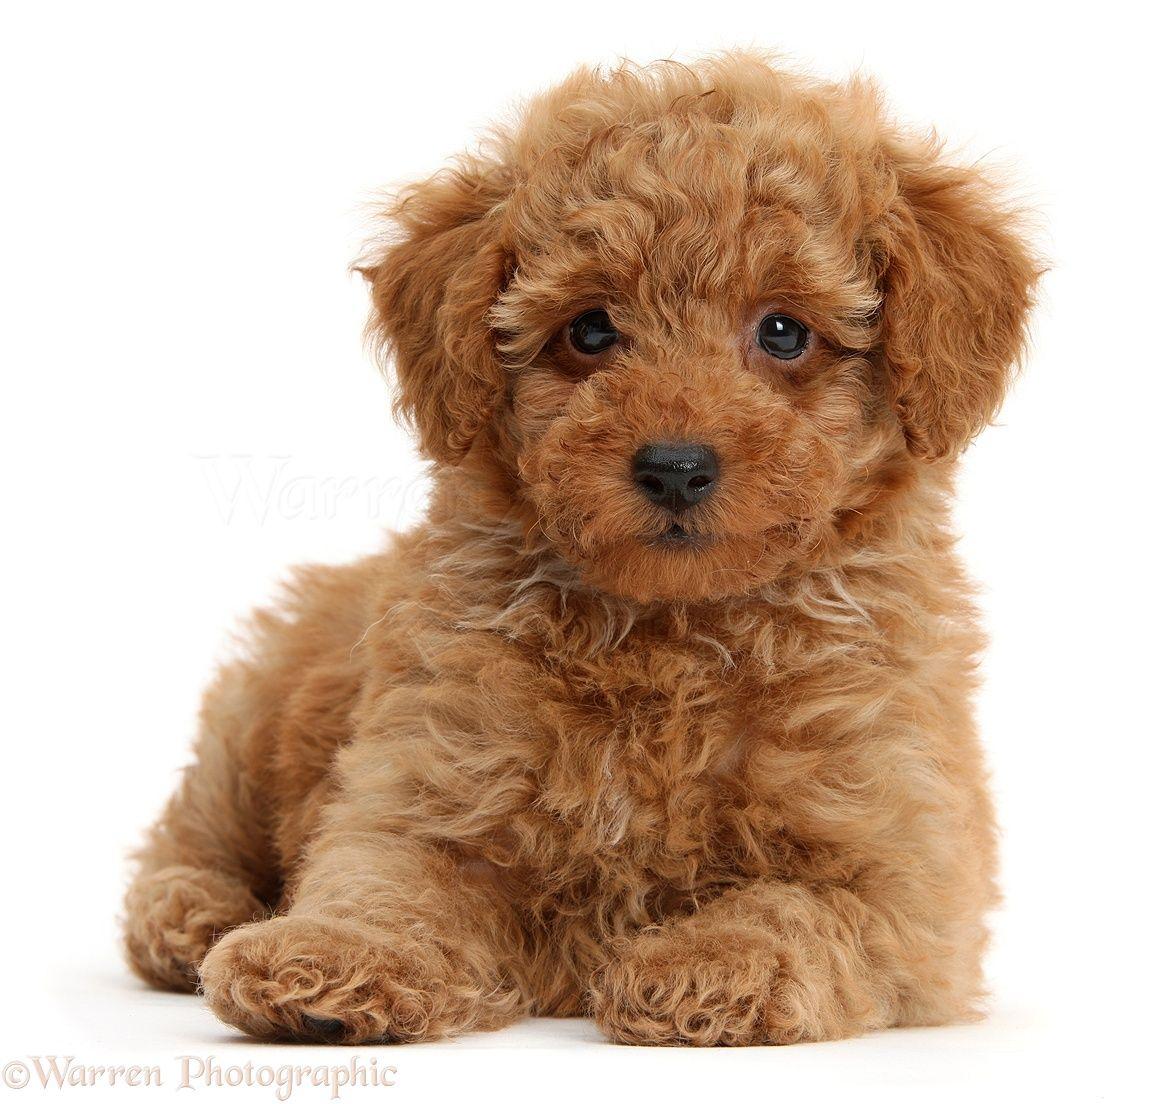 Adorable Poodle Puppy Toy Poodle Puppy Poodle Puppy Red Poodles